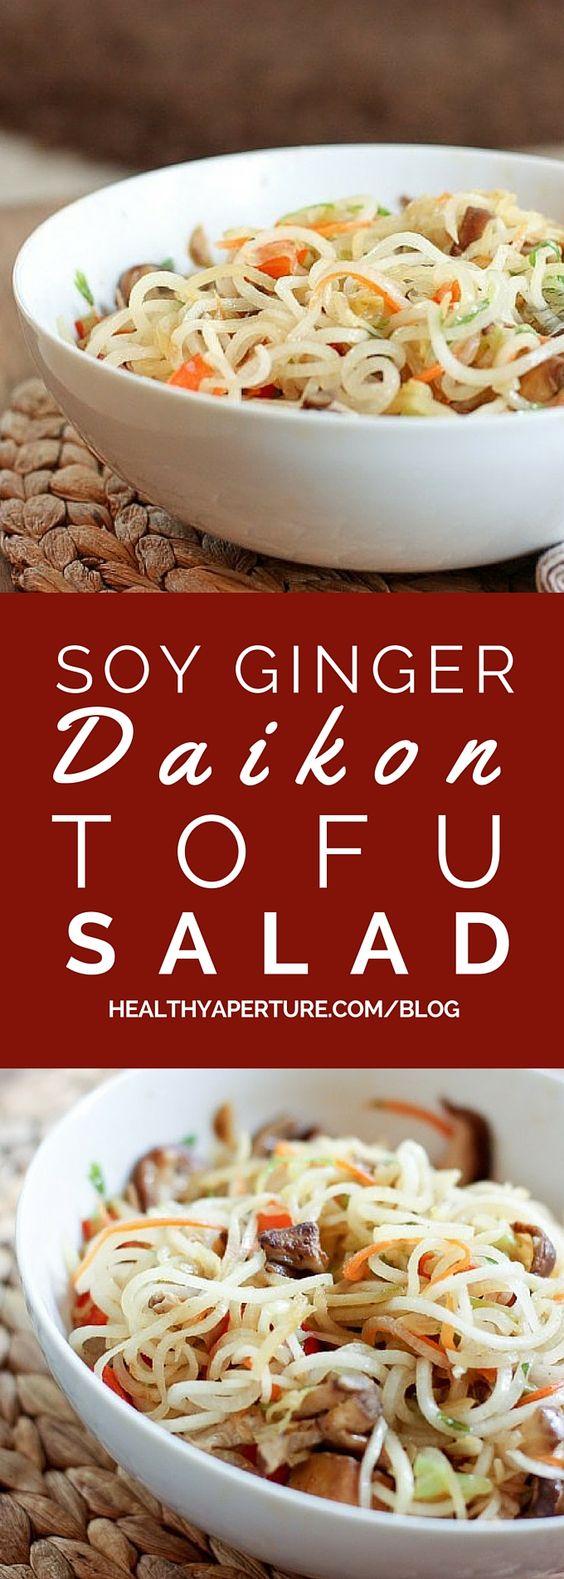 Soy Ginger Daikon and Tofu Salad | Recipe | Veggie Noodles, Noodle ...